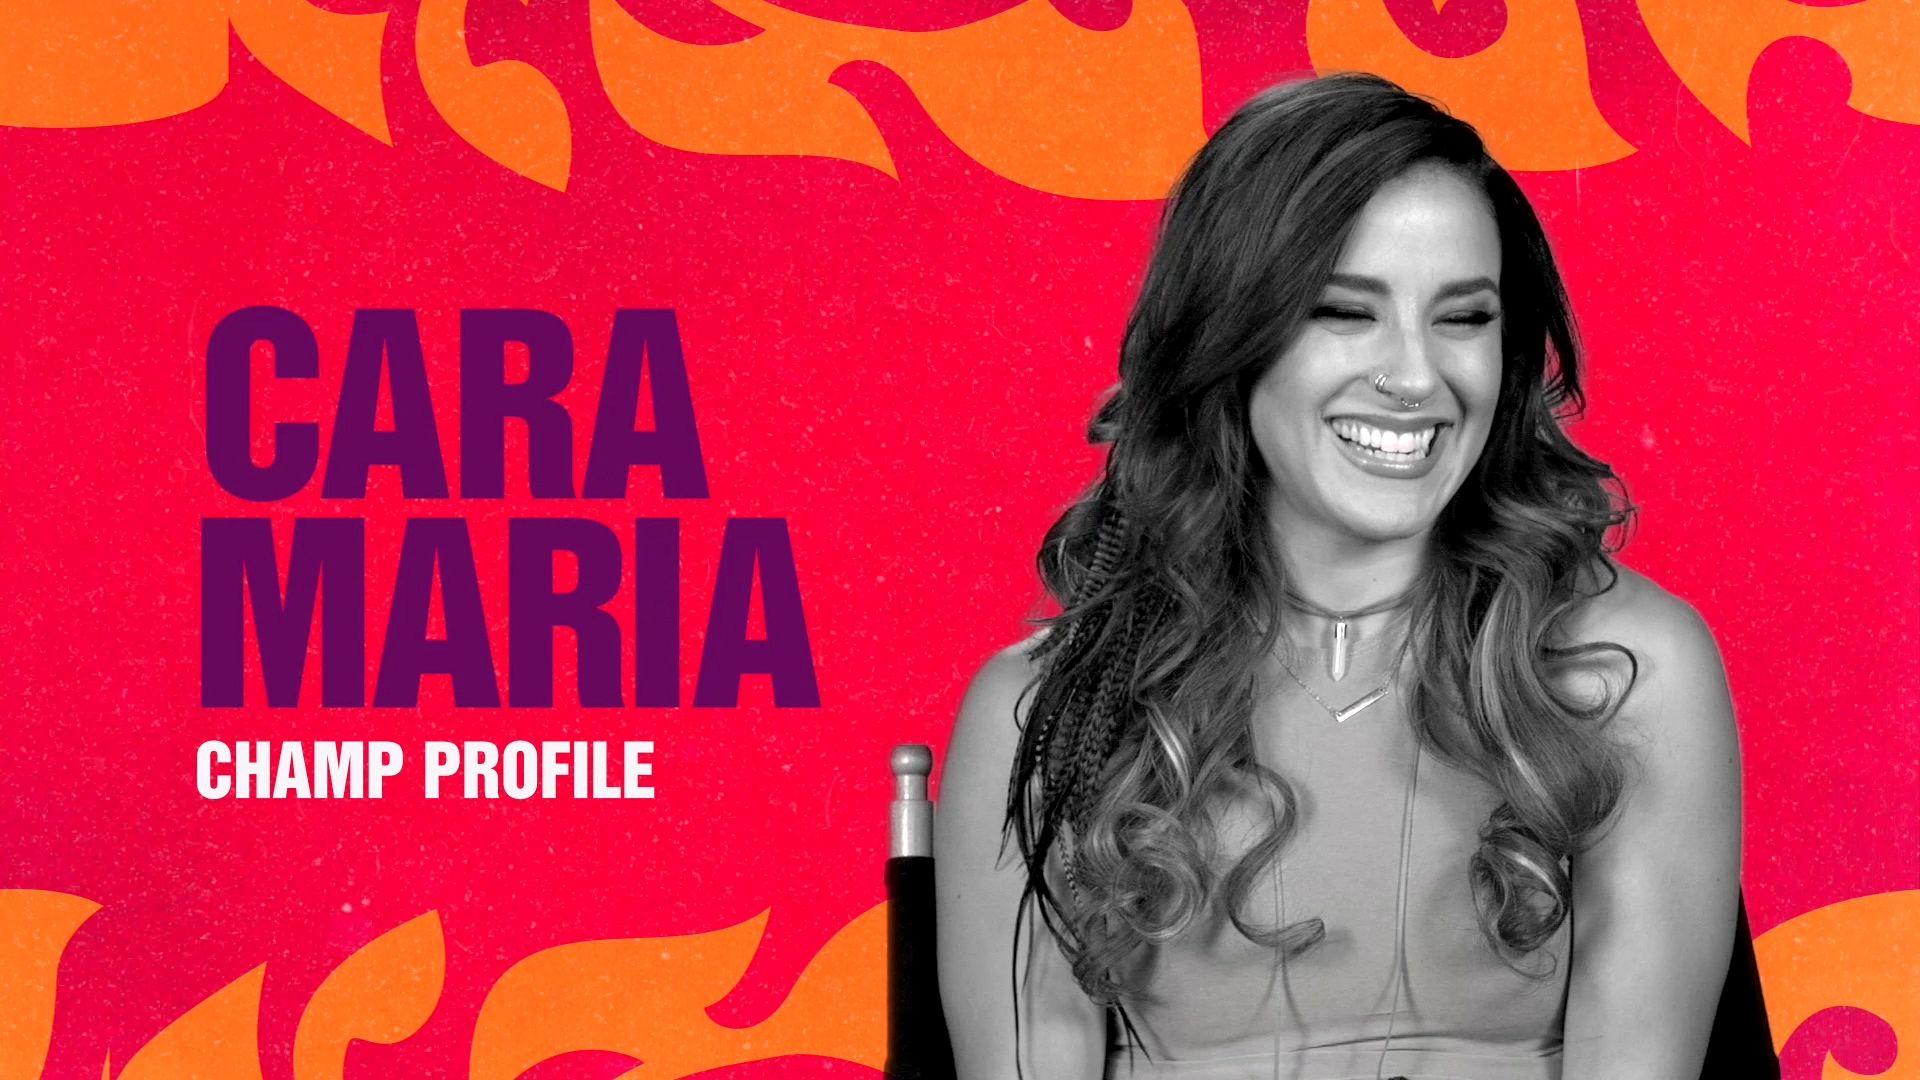 Bonus - Champ Profile: Cara Maria - The Challenge ...